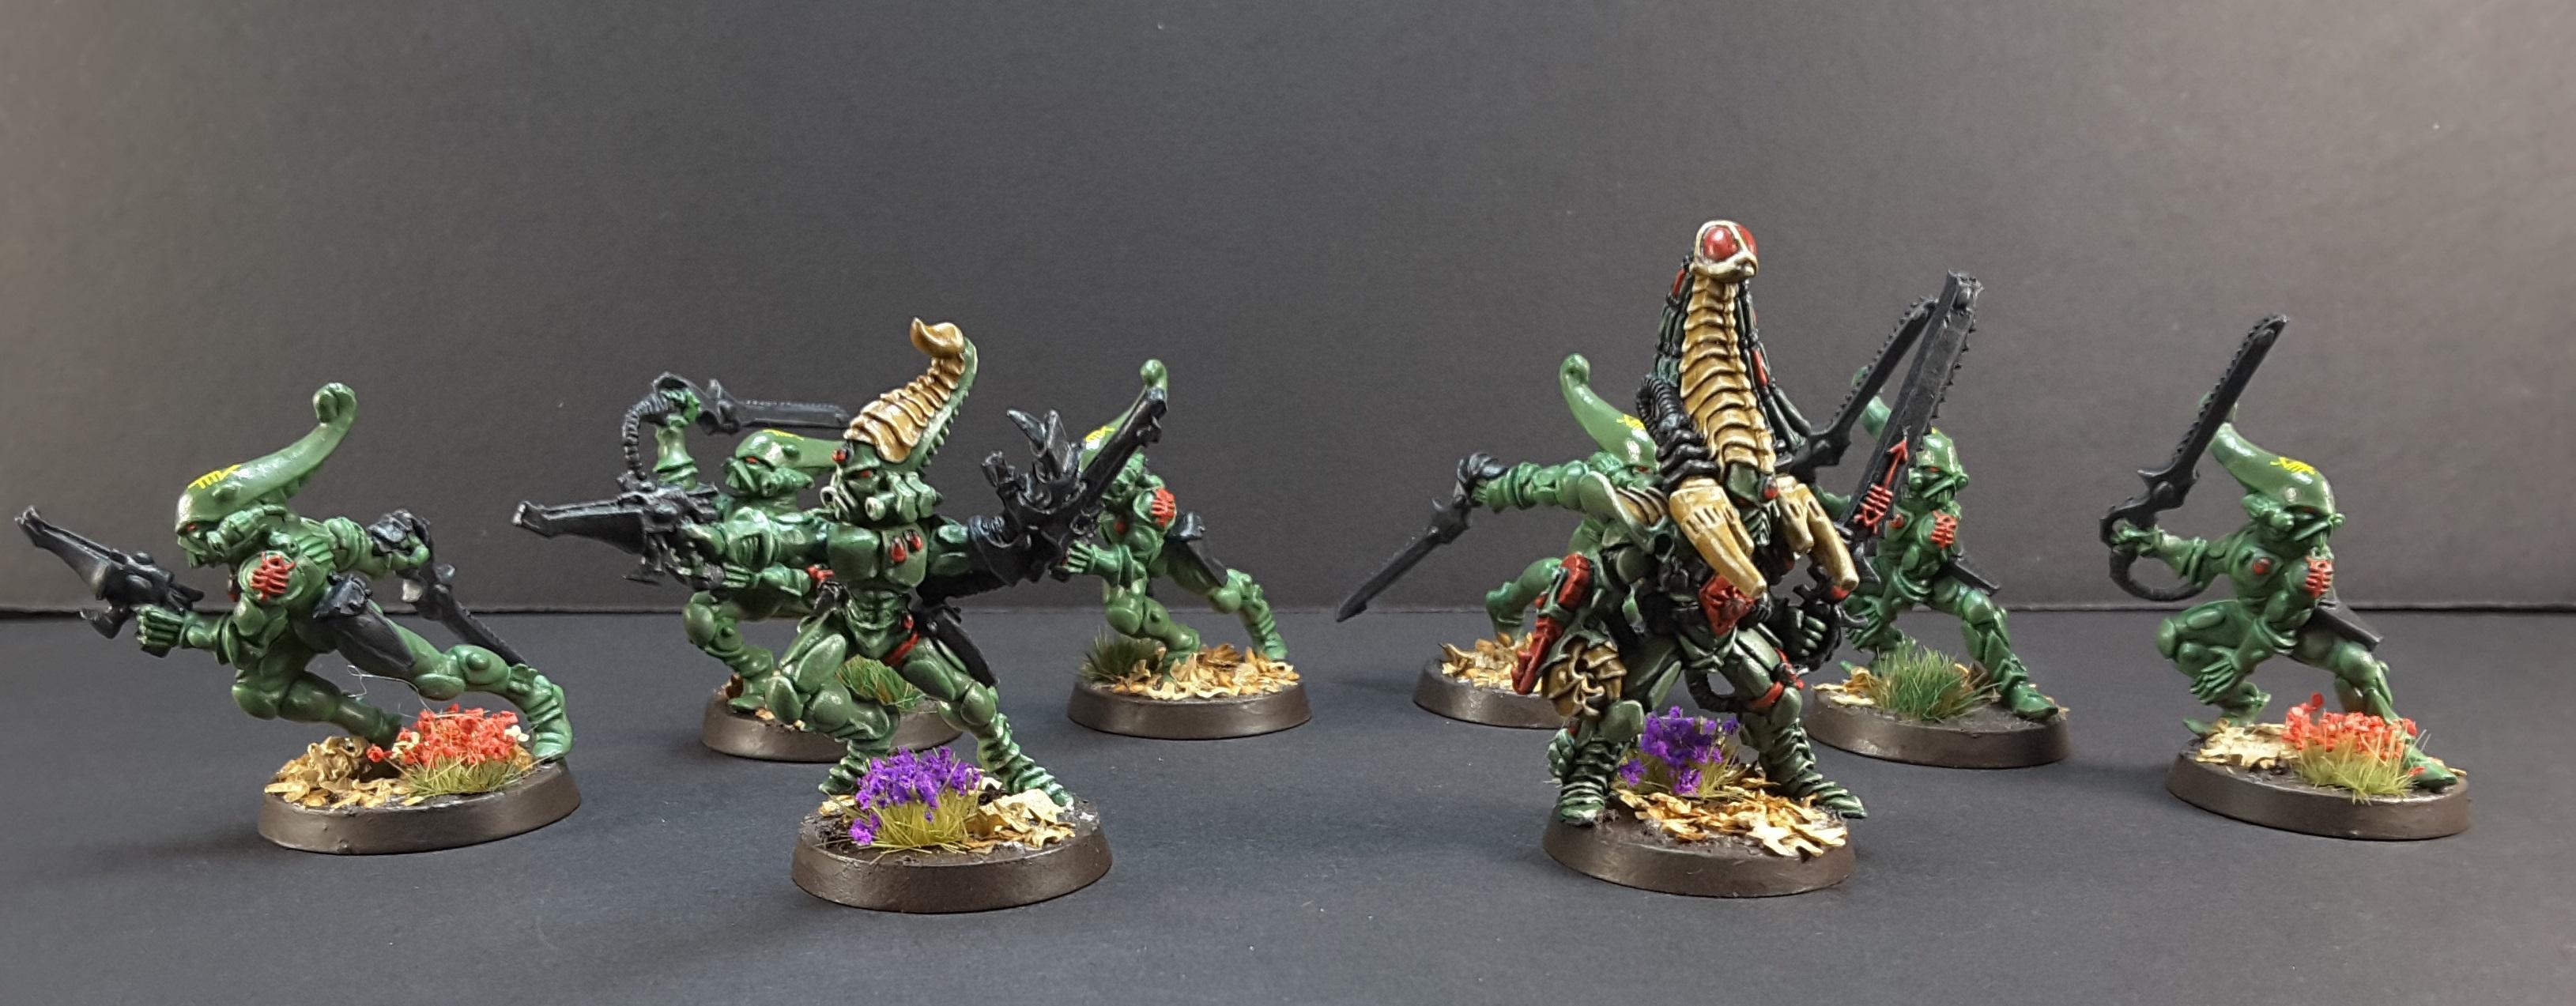 Aspect Warrior, Eldar, Exarch, Karandras, Striking Scorpions